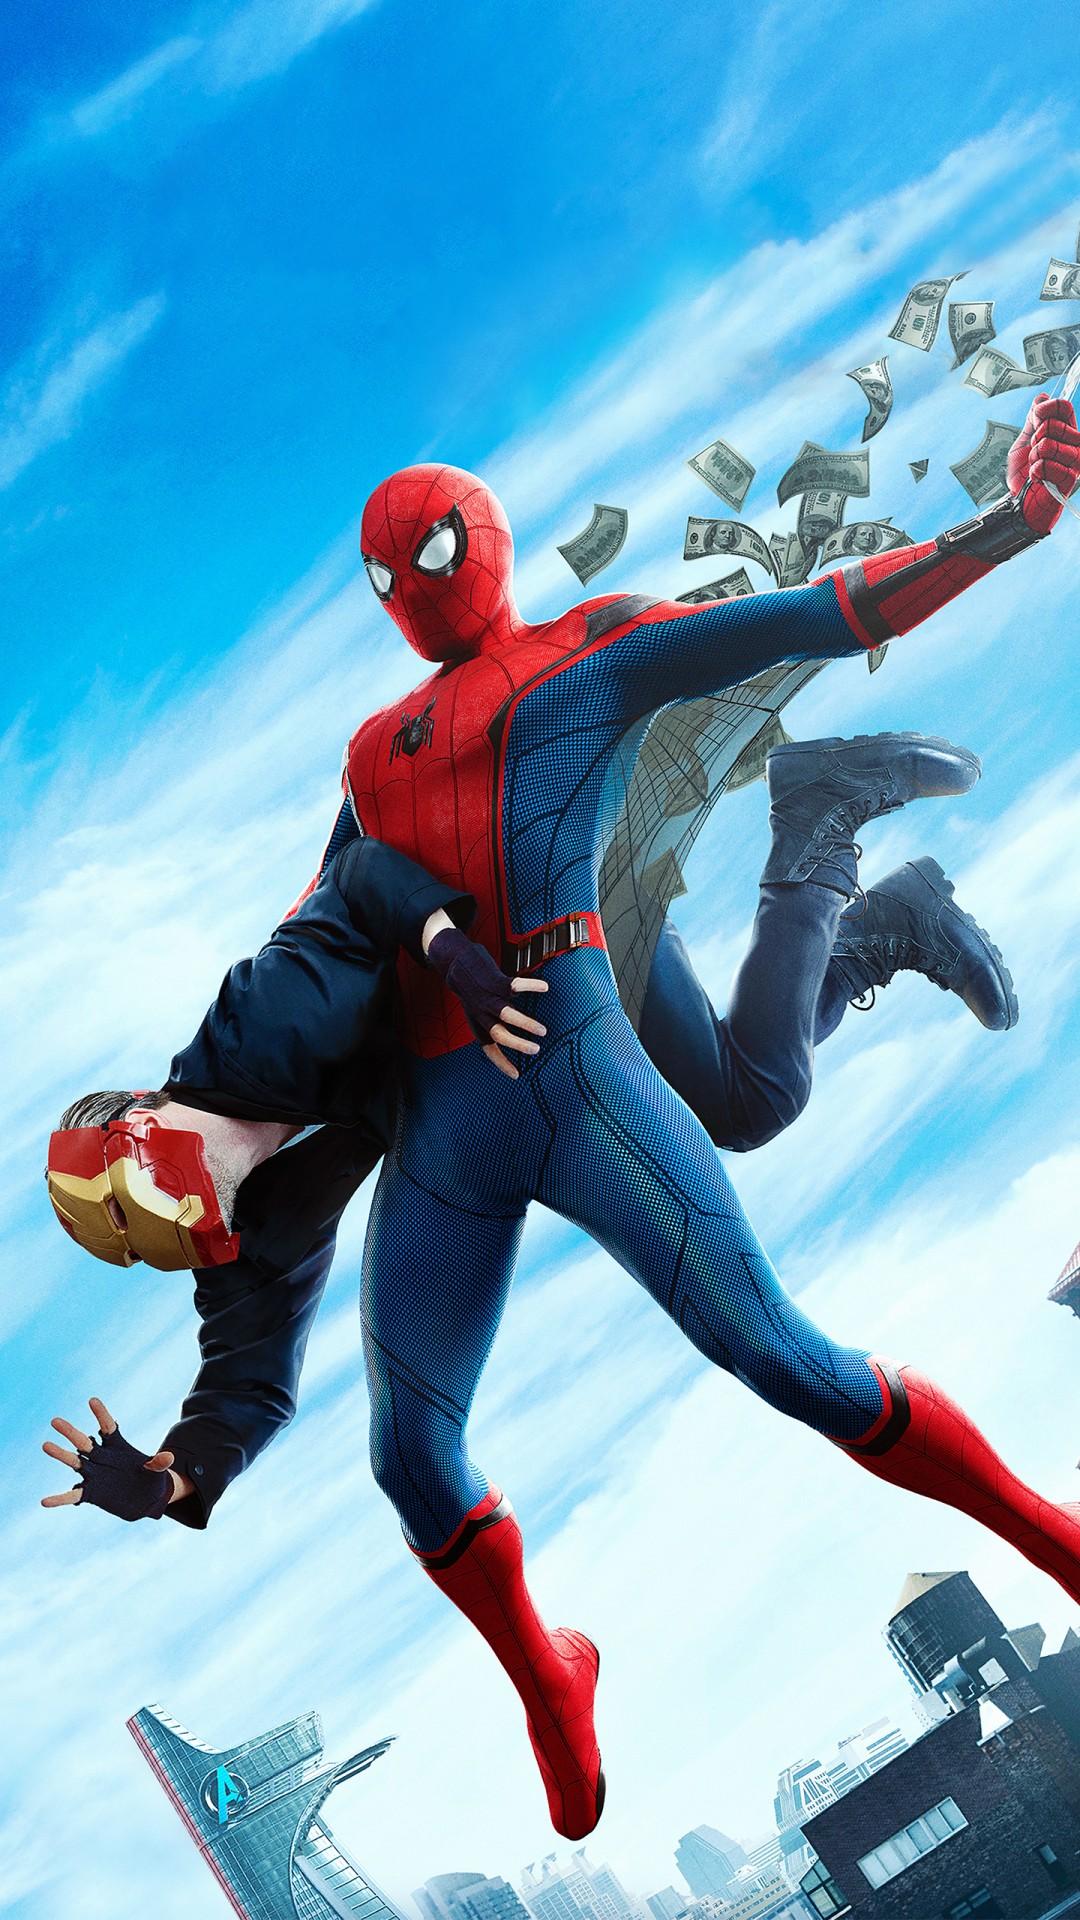 Spiderman Wallpaper Iphone X Spiderman Homecoming Hd 2017 Wallpapers Hd Wallpapers